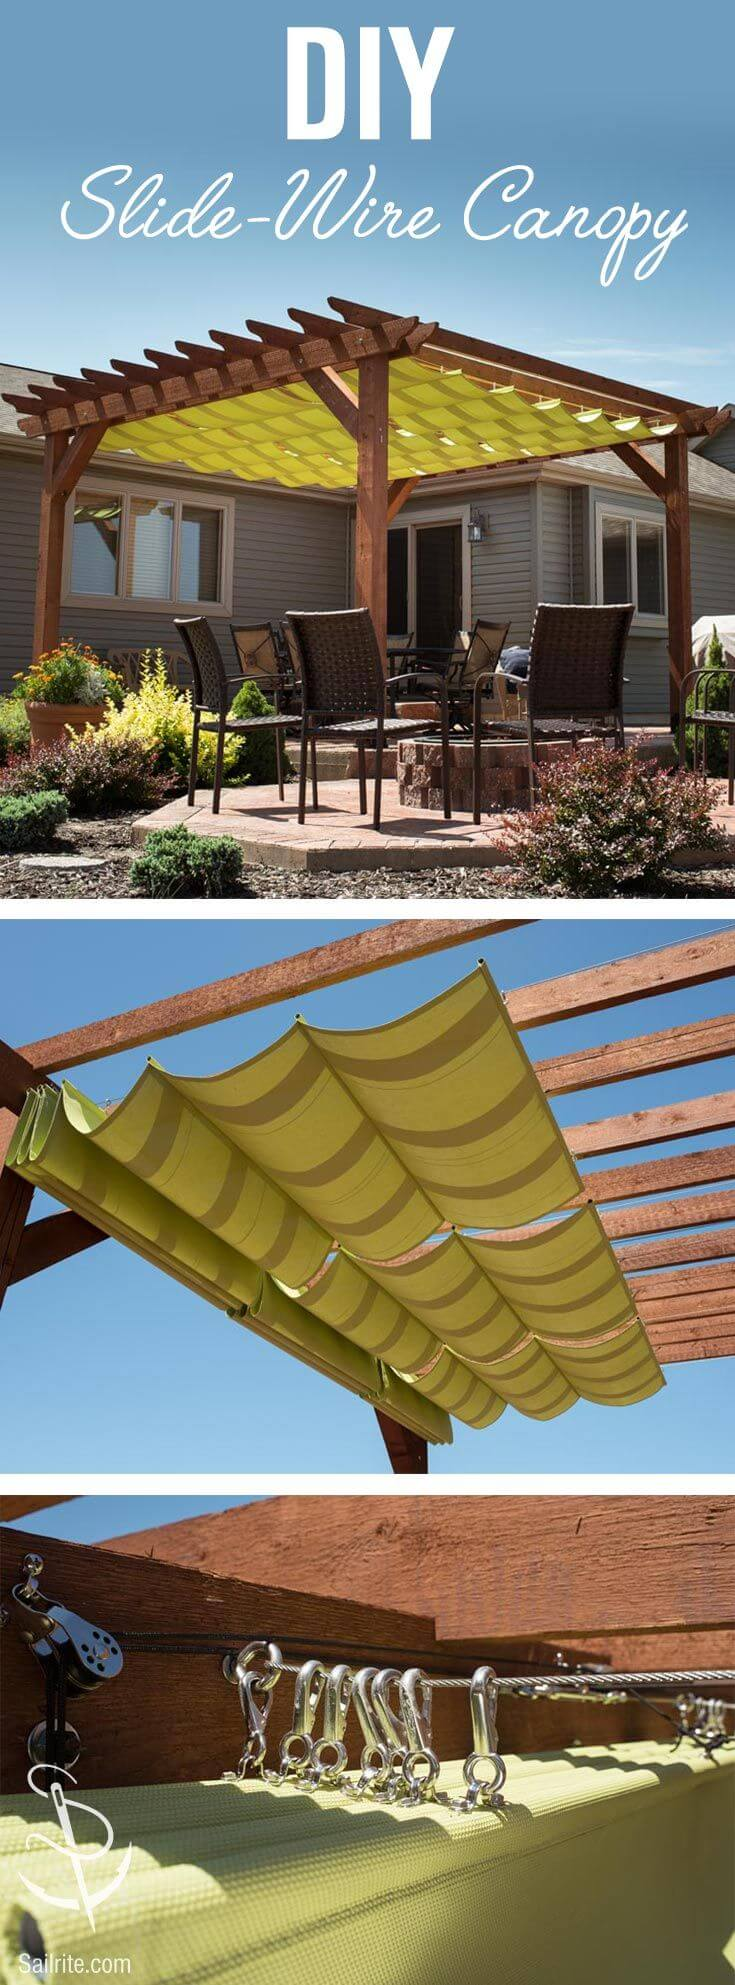 Fullsize Of Backyard Ideas Diy